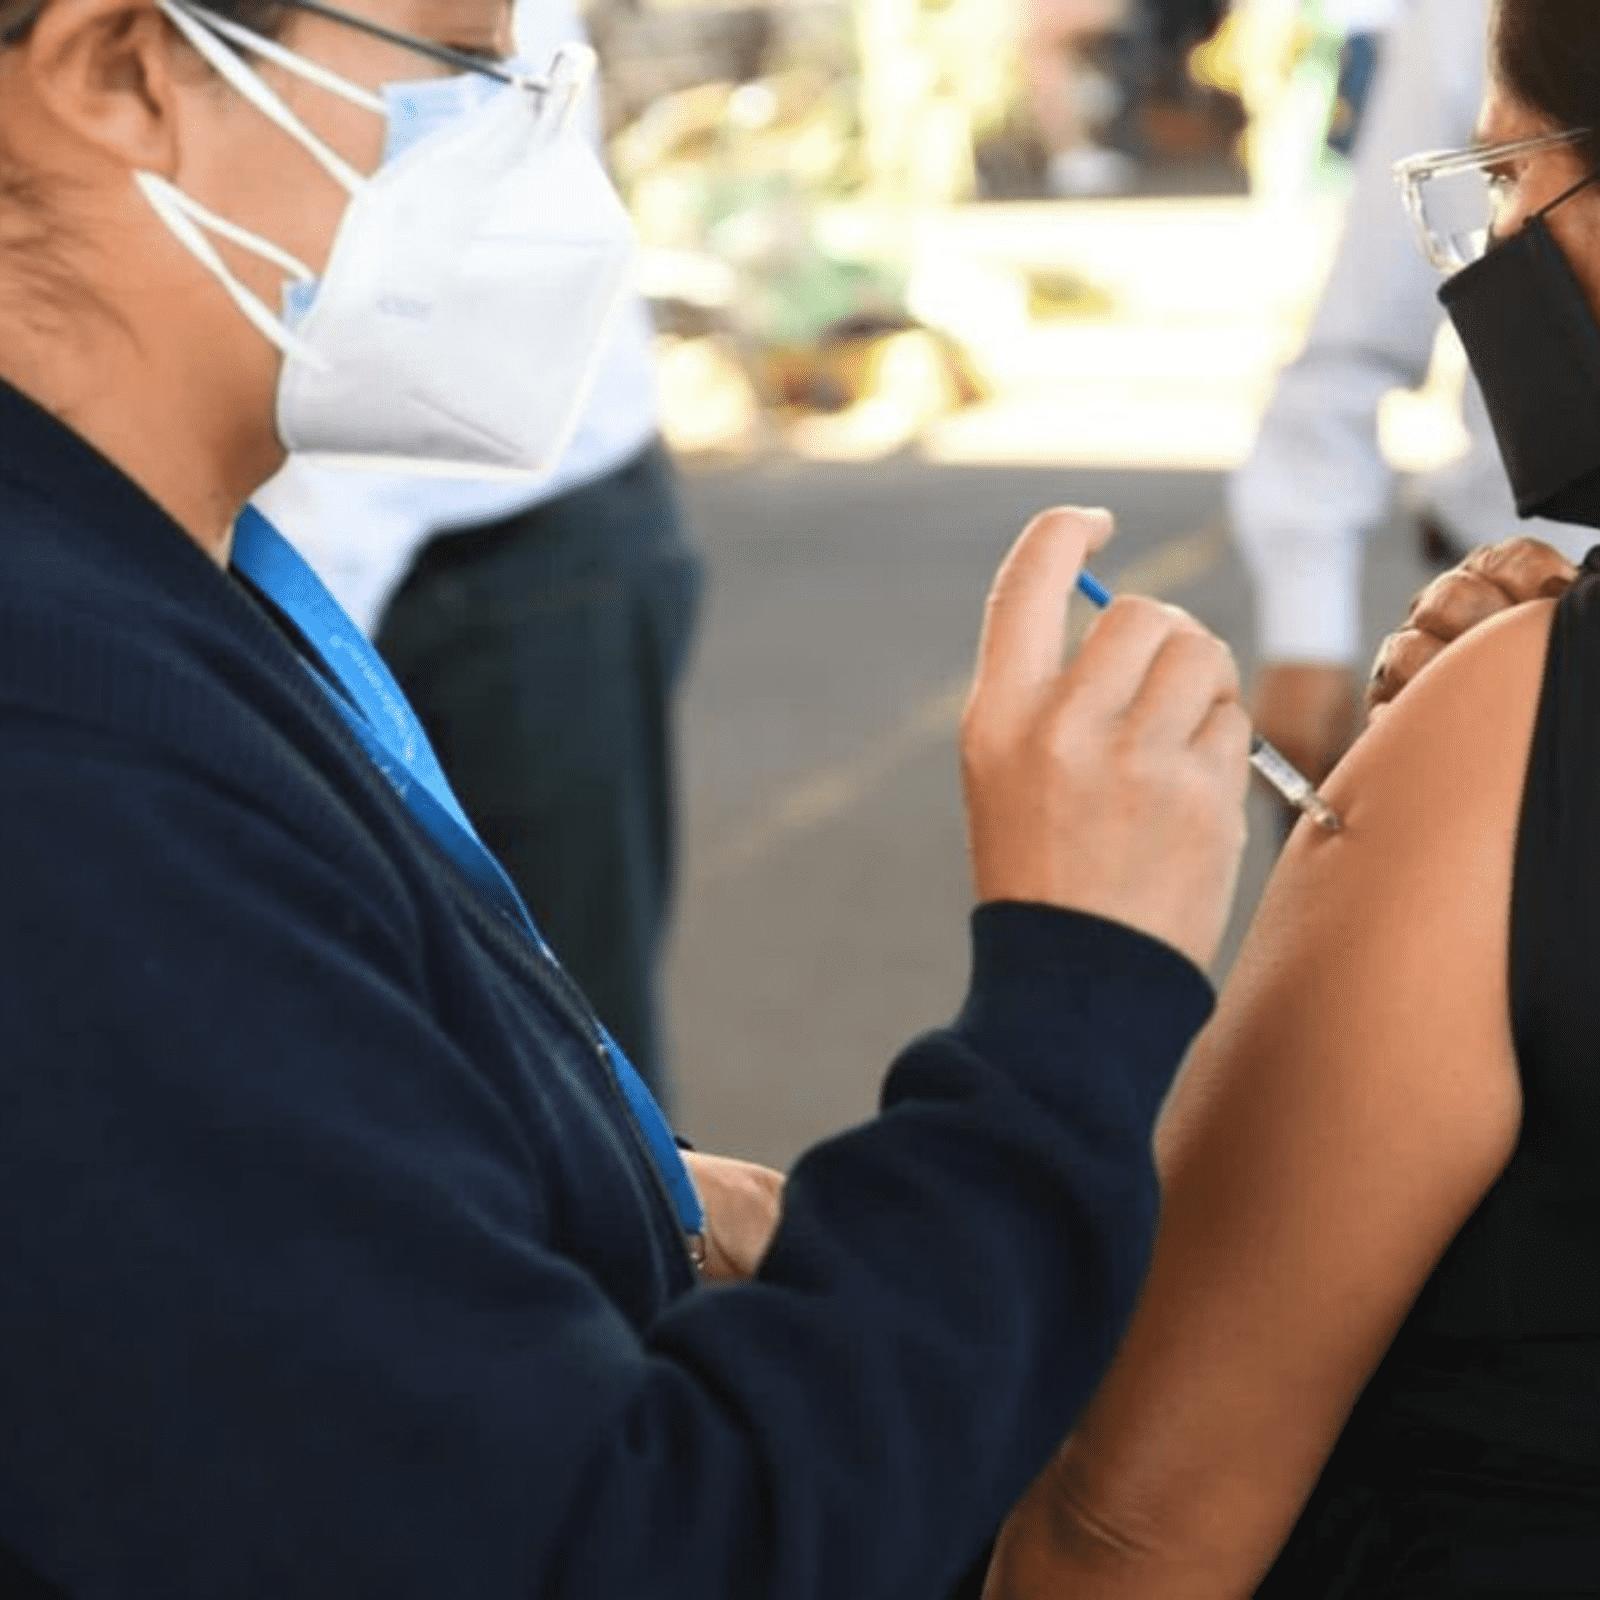 Vacunación masiva covid imagen ilsutrativa.